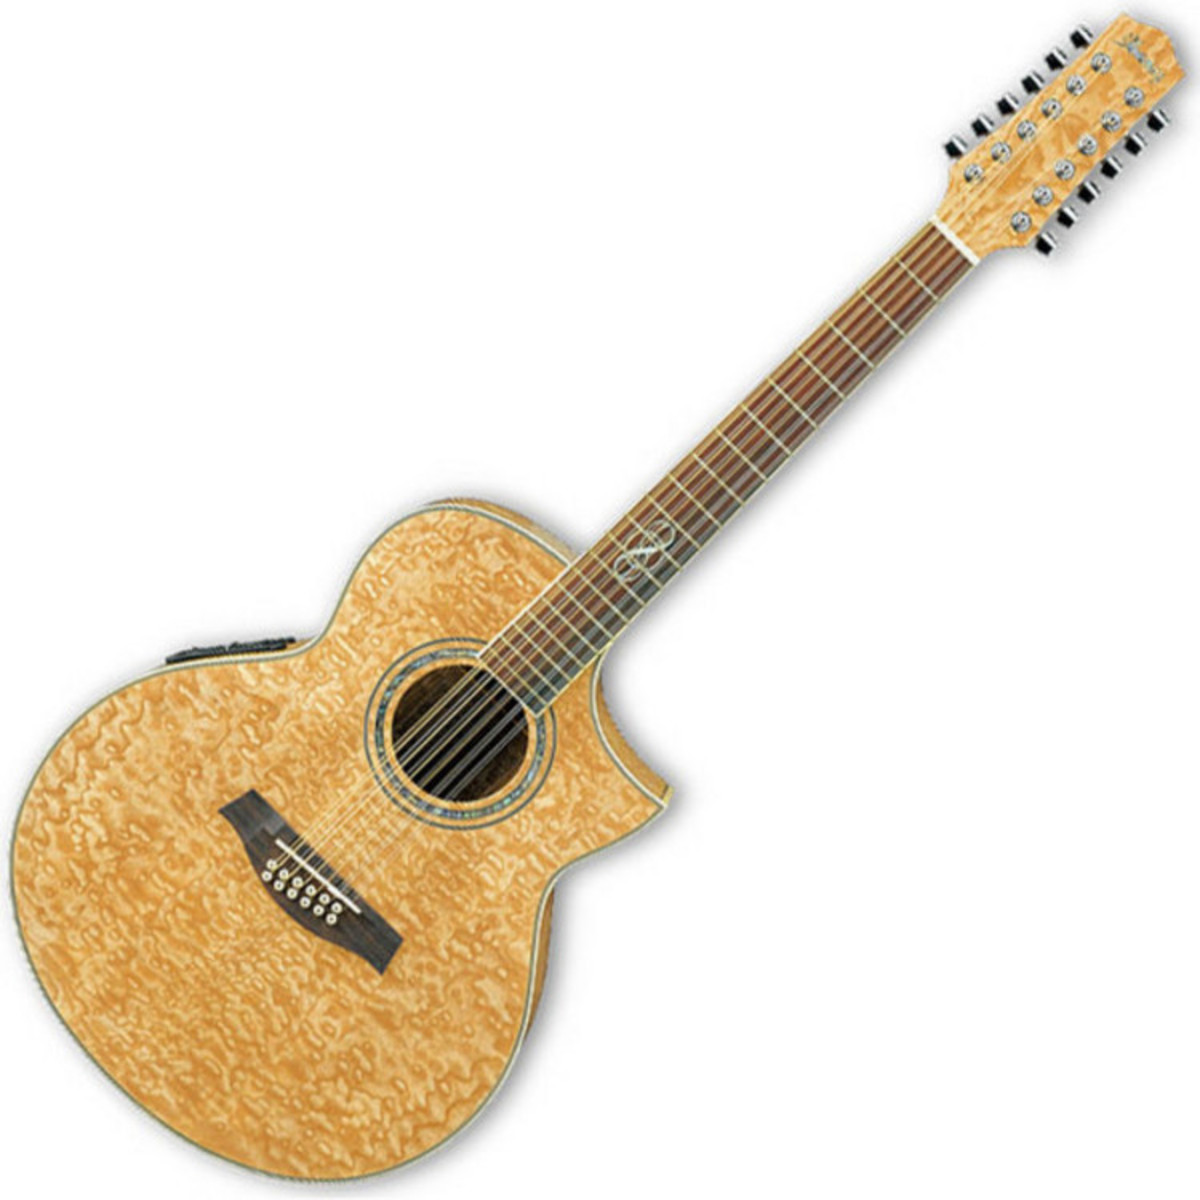 disc ibanez ew2012ase nt 12 string acoustic guitar natural at. Black Bedroom Furniture Sets. Home Design Ideas